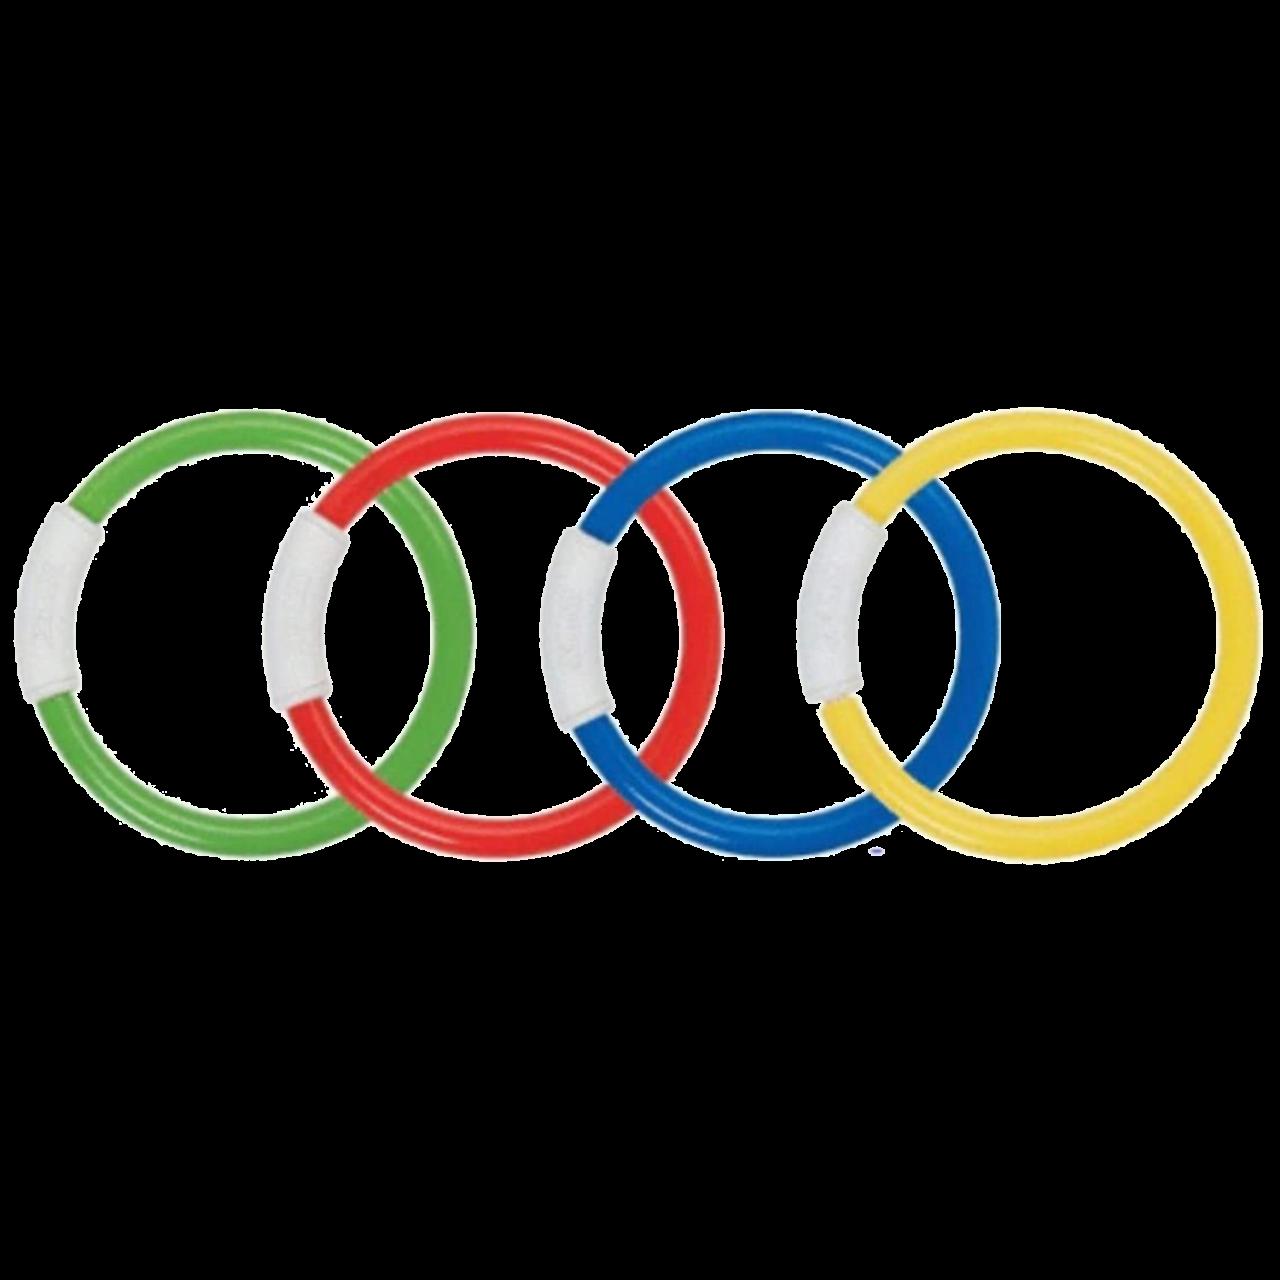 Intex Tauchspiel Dive Rings, Mehrfarbig, 4-teilig